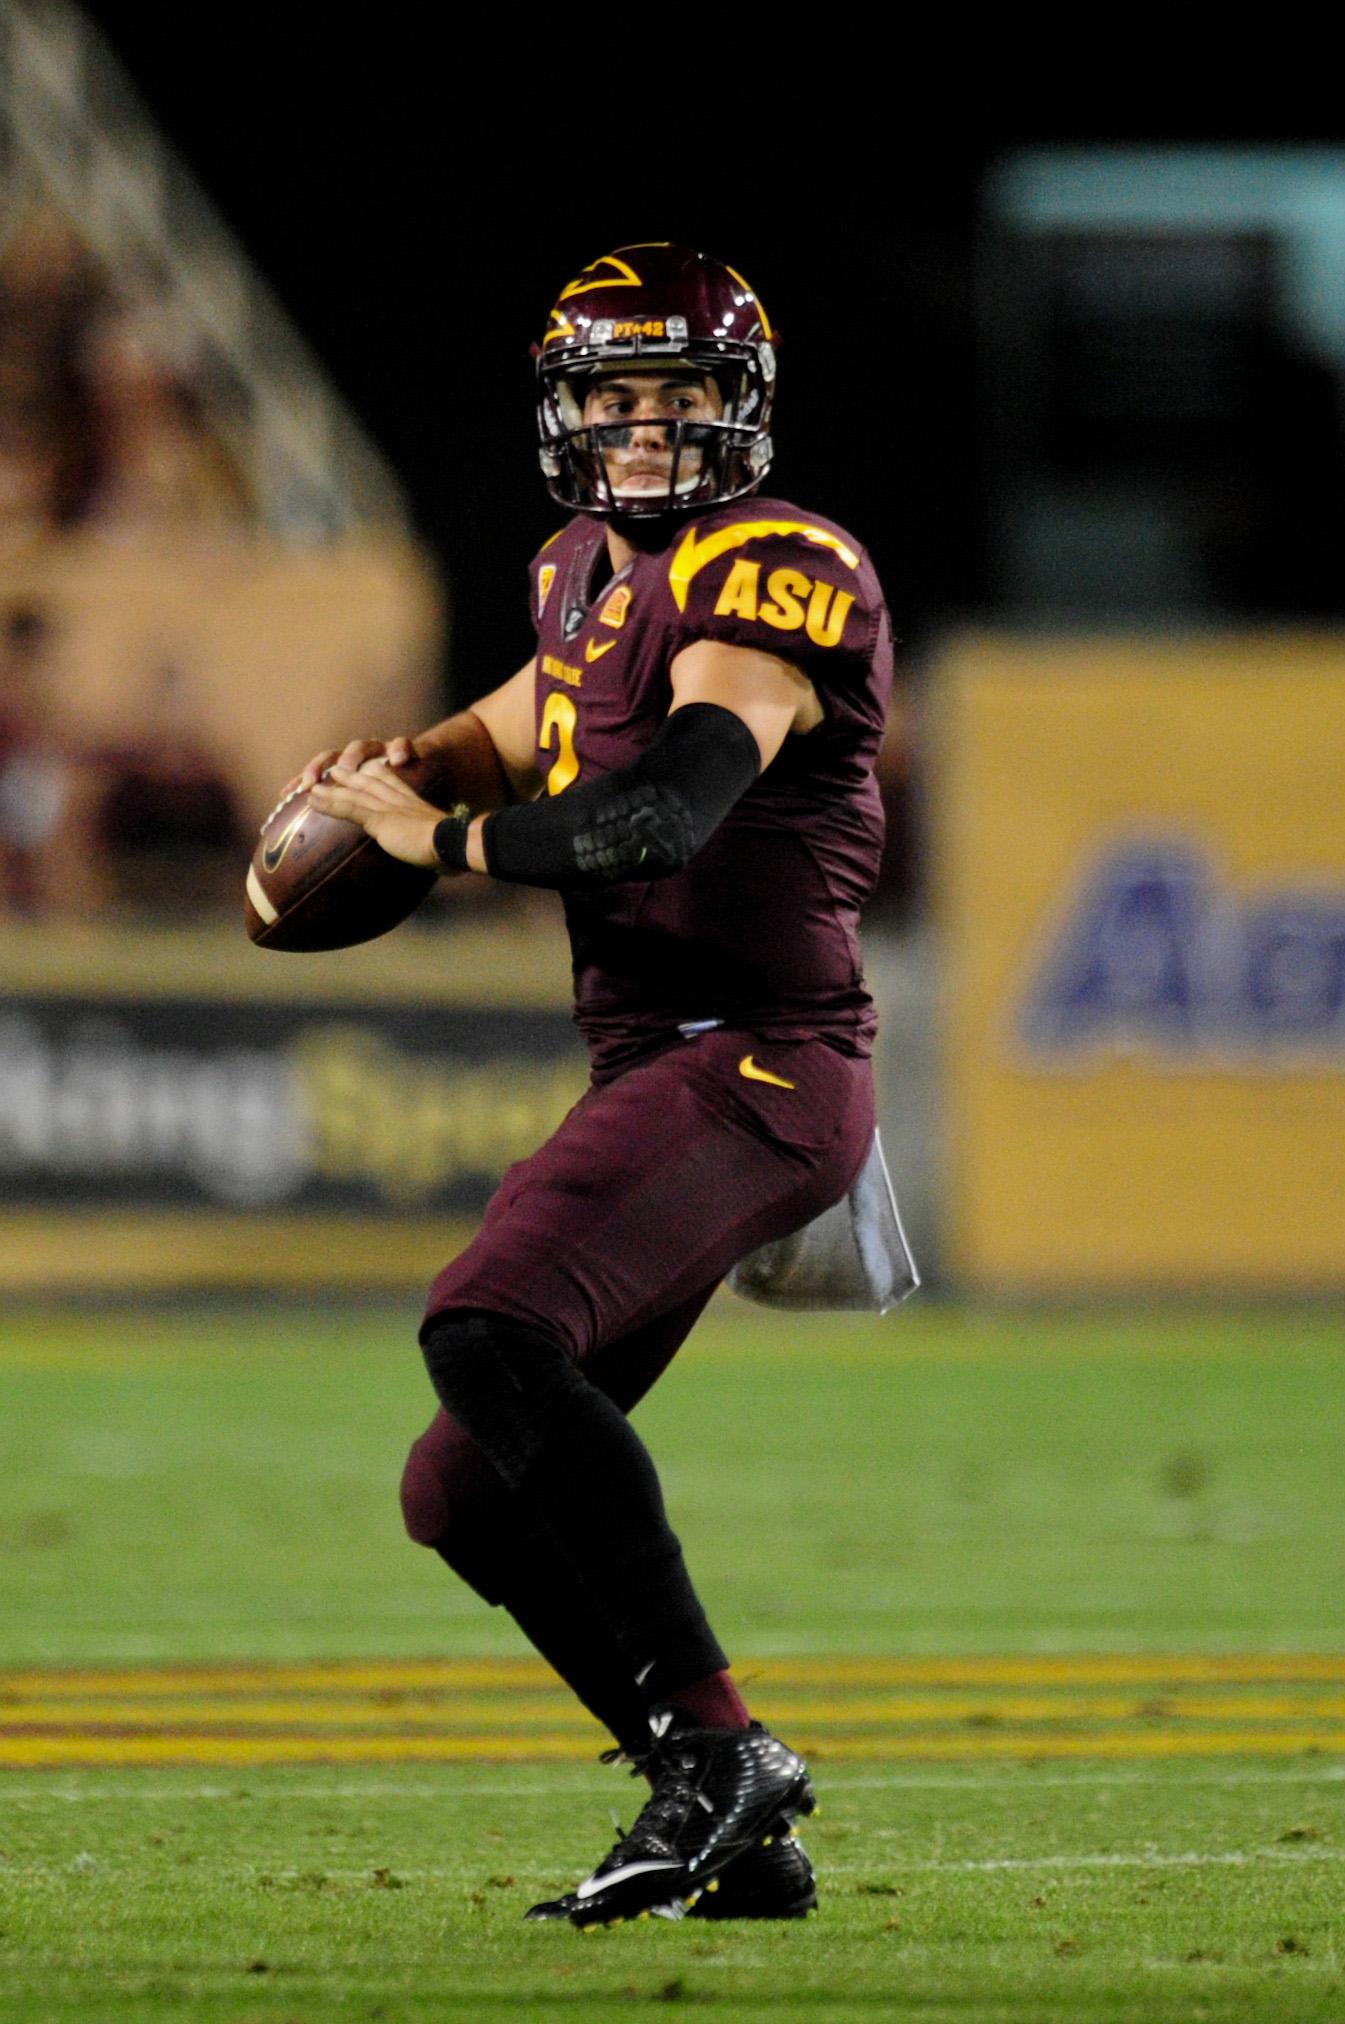 Some schools struggle to replace great quarterbacks, but ASU has Mike Bercovici.